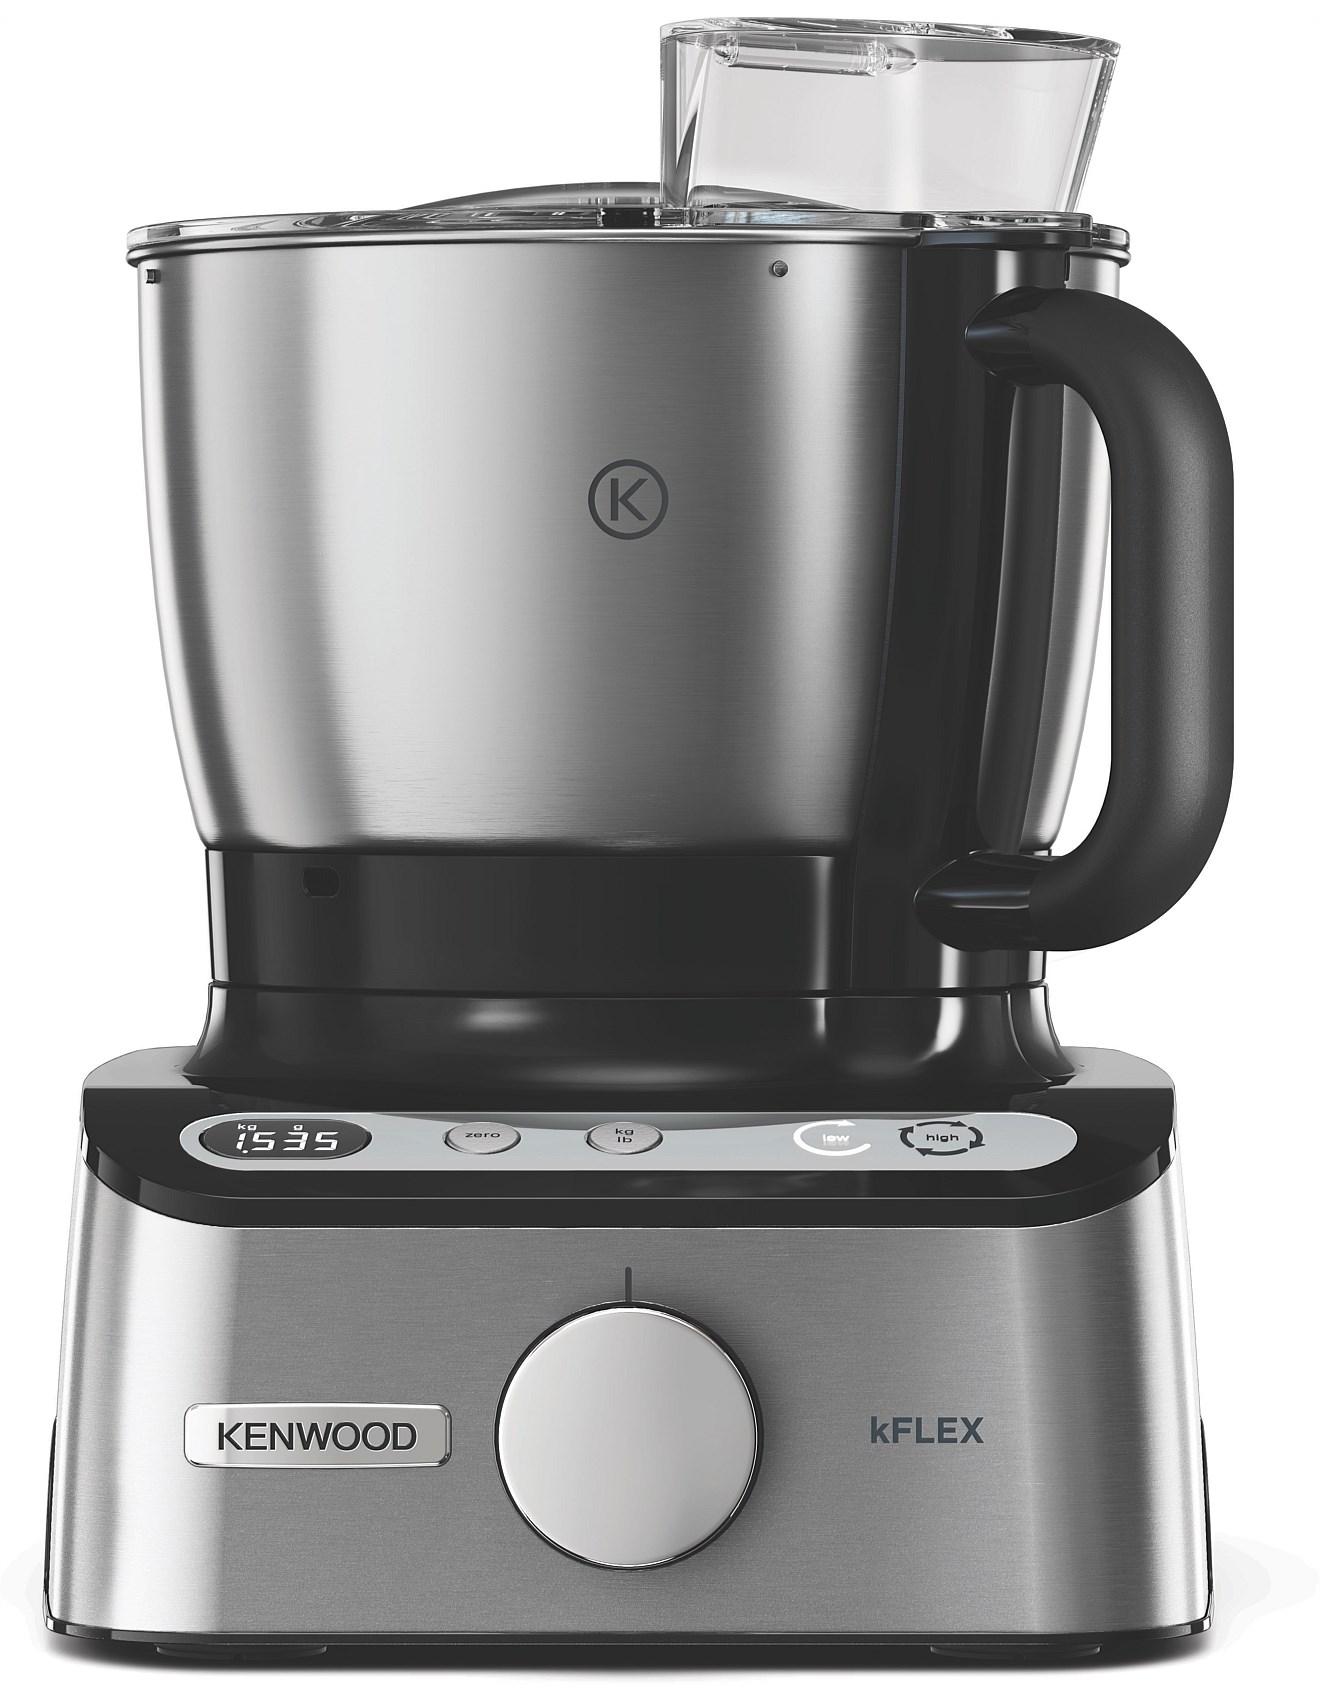 kenwood kflex food processor review